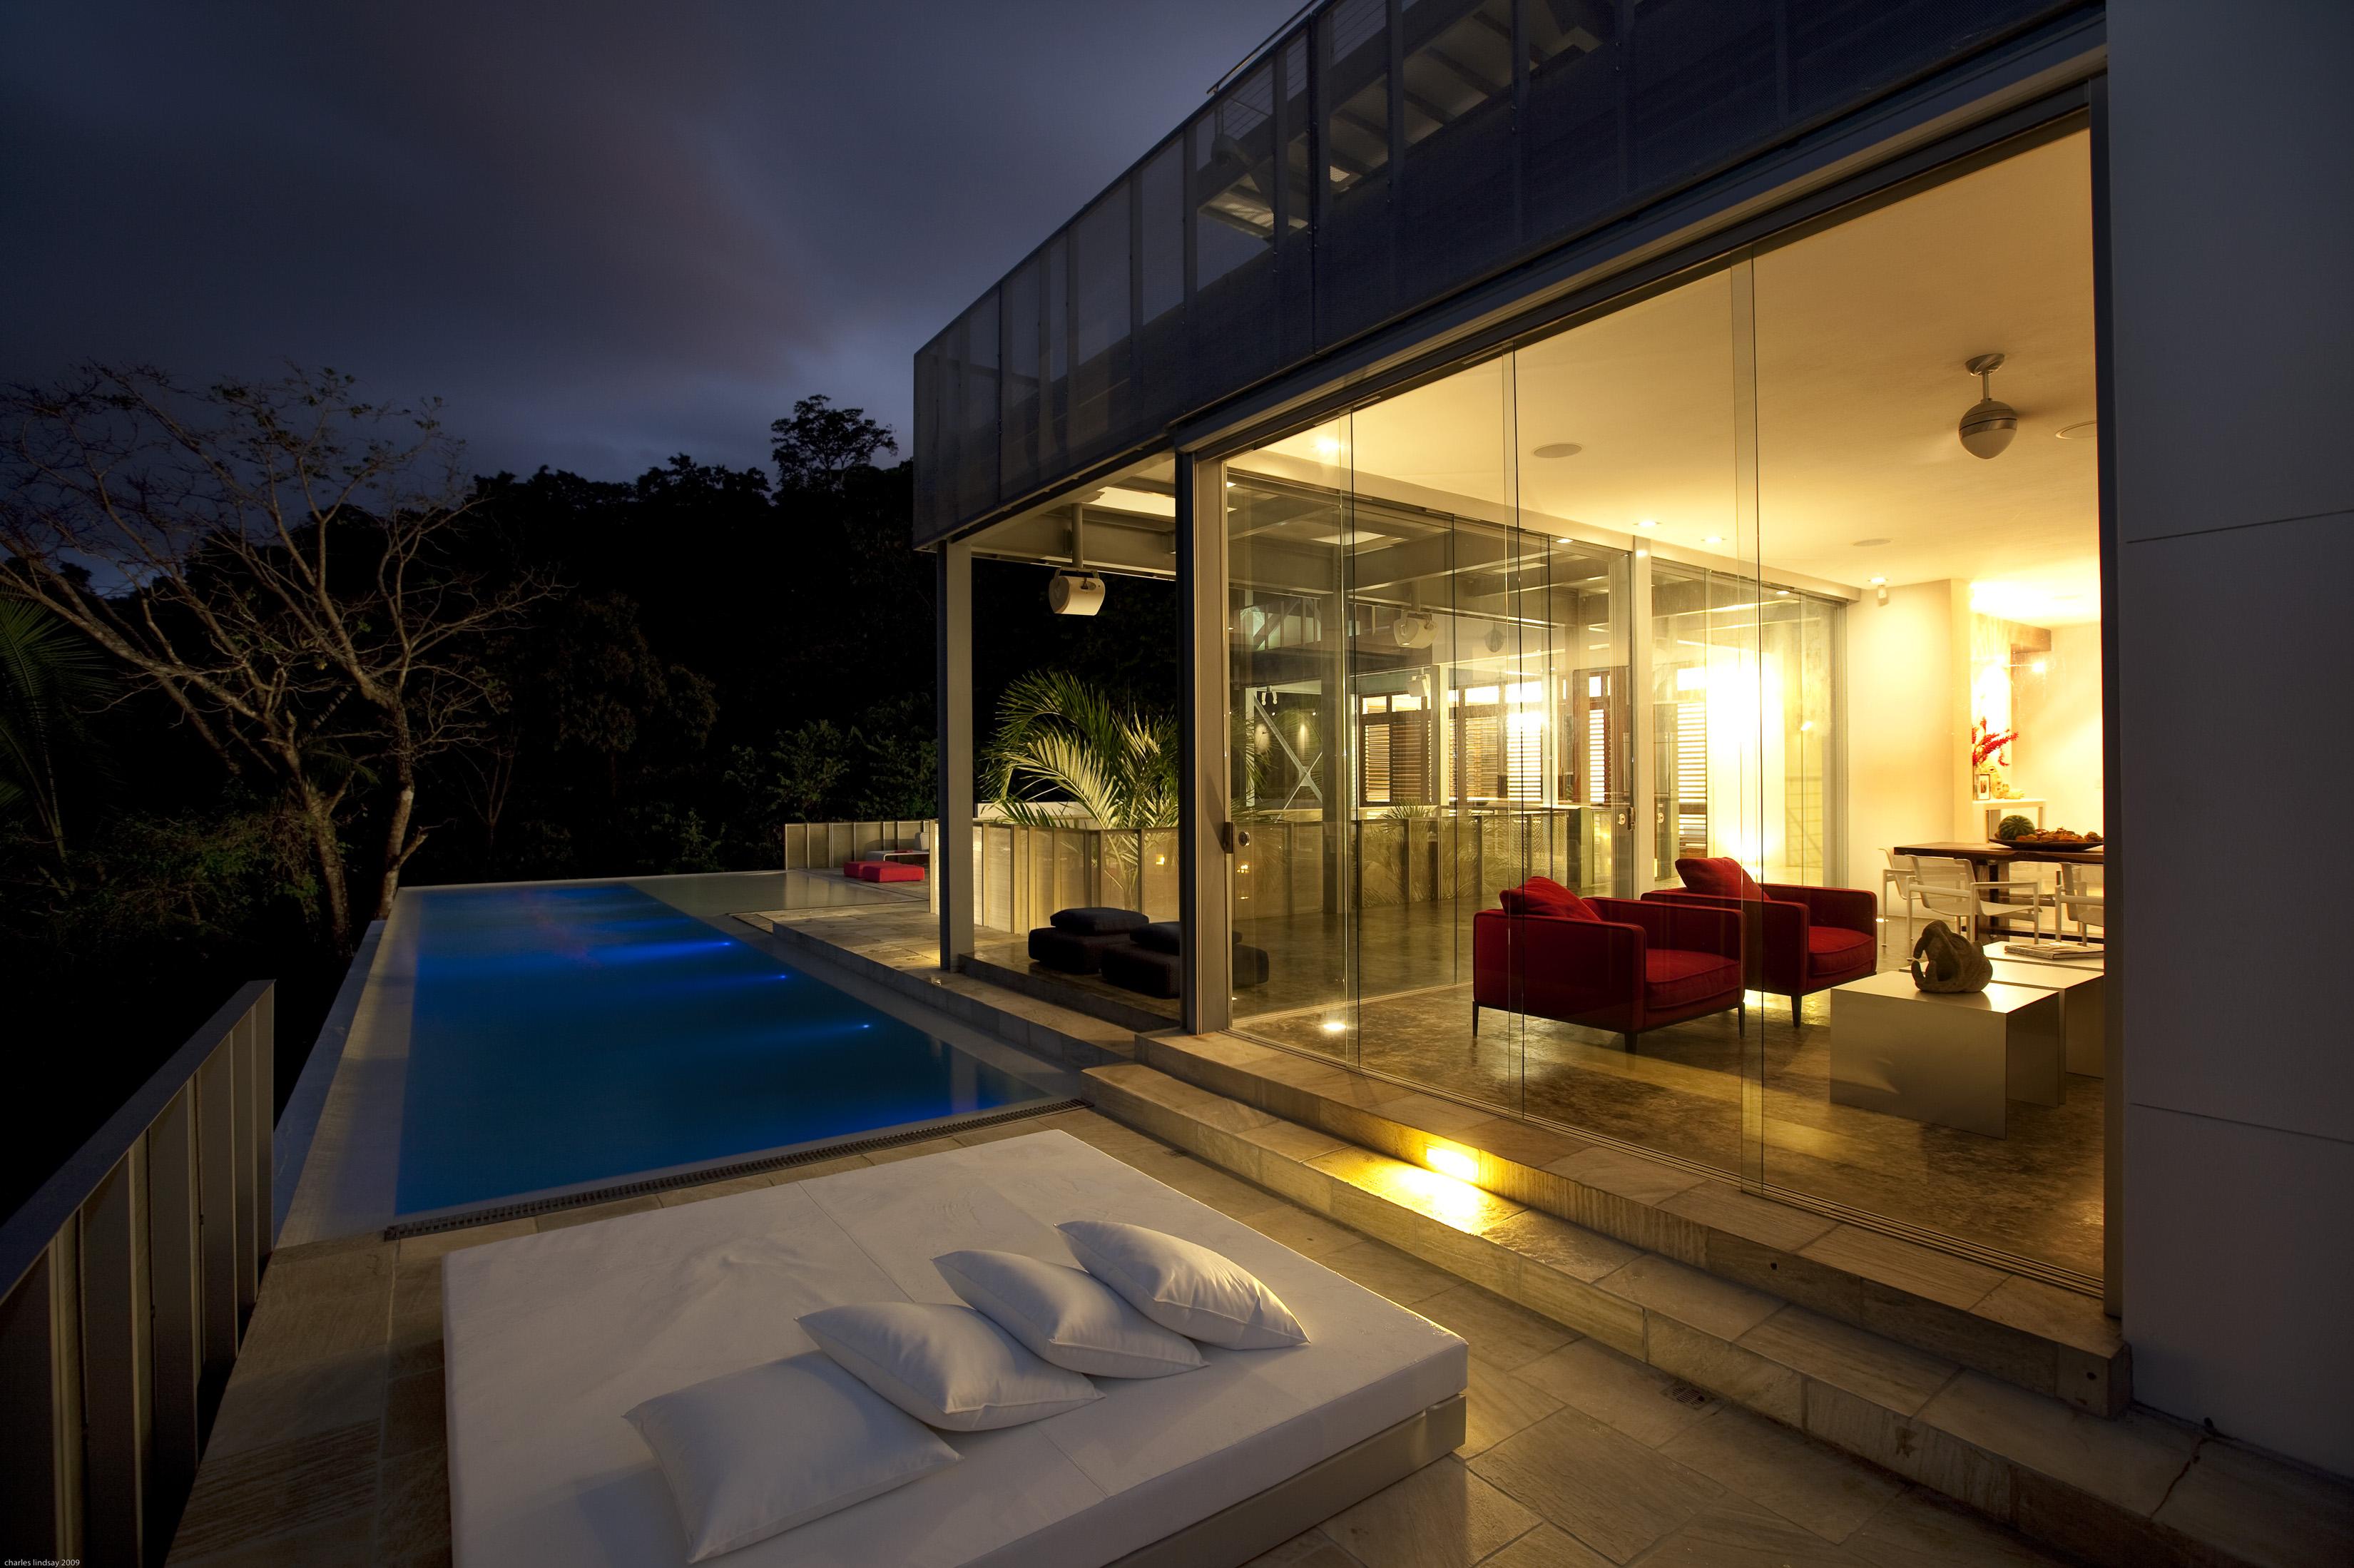 14 living and infinity pool